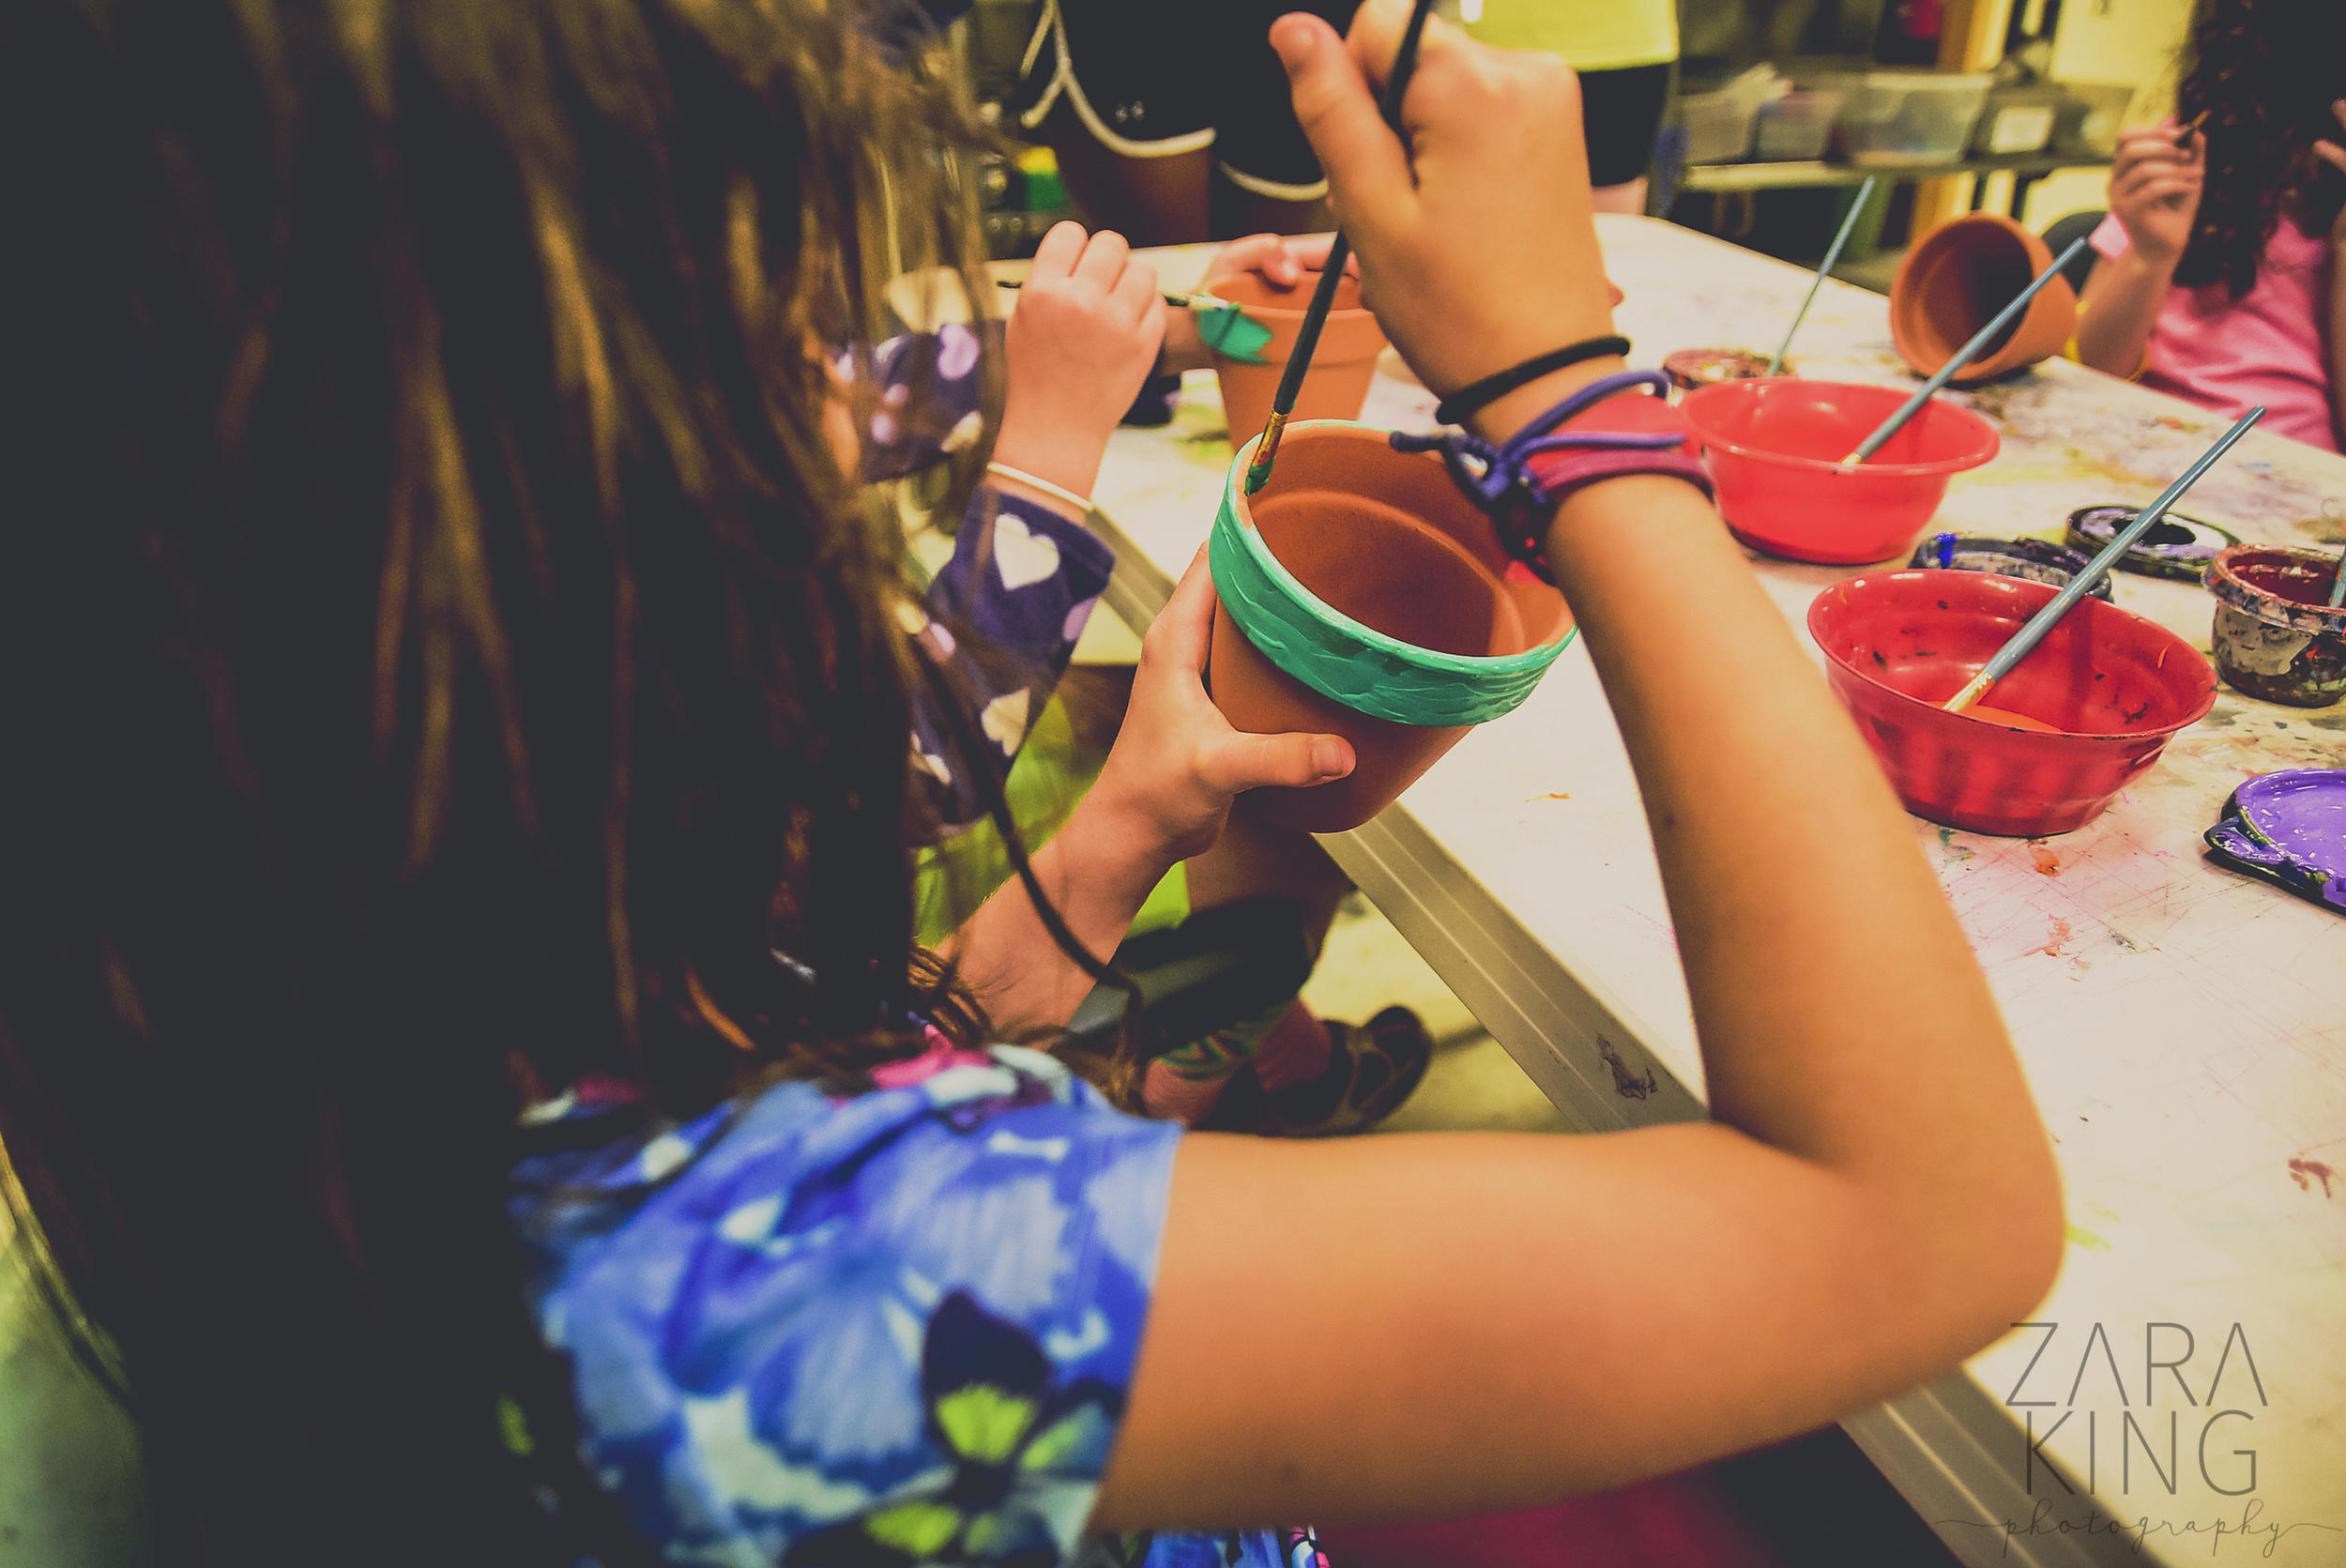 camp winona arts and crafts